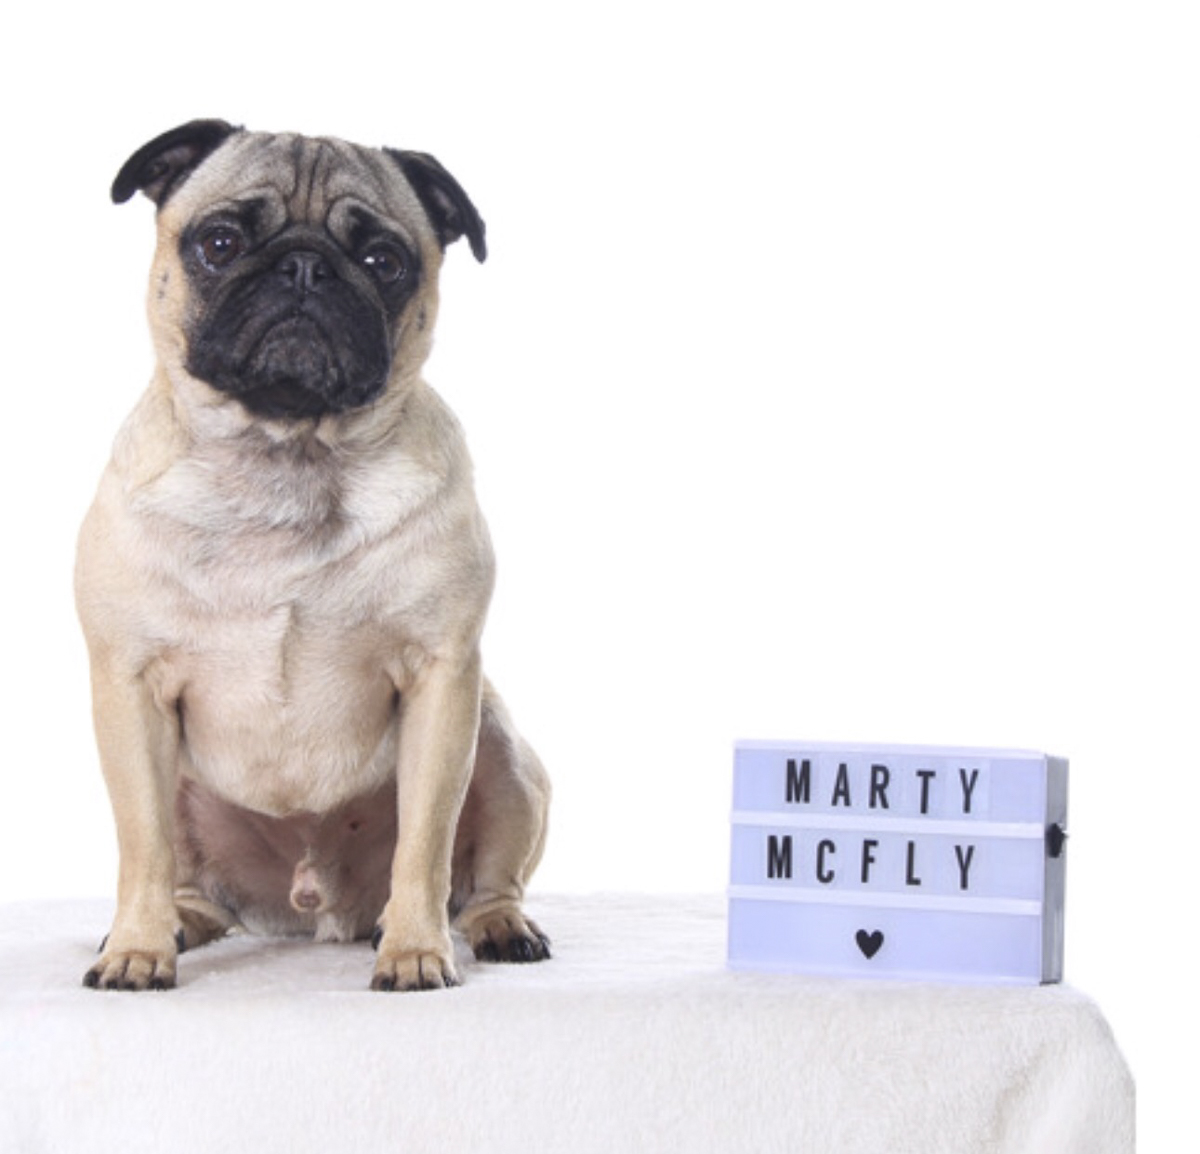 Marty McFly Social Pug Profile | www.thepugdiary.com